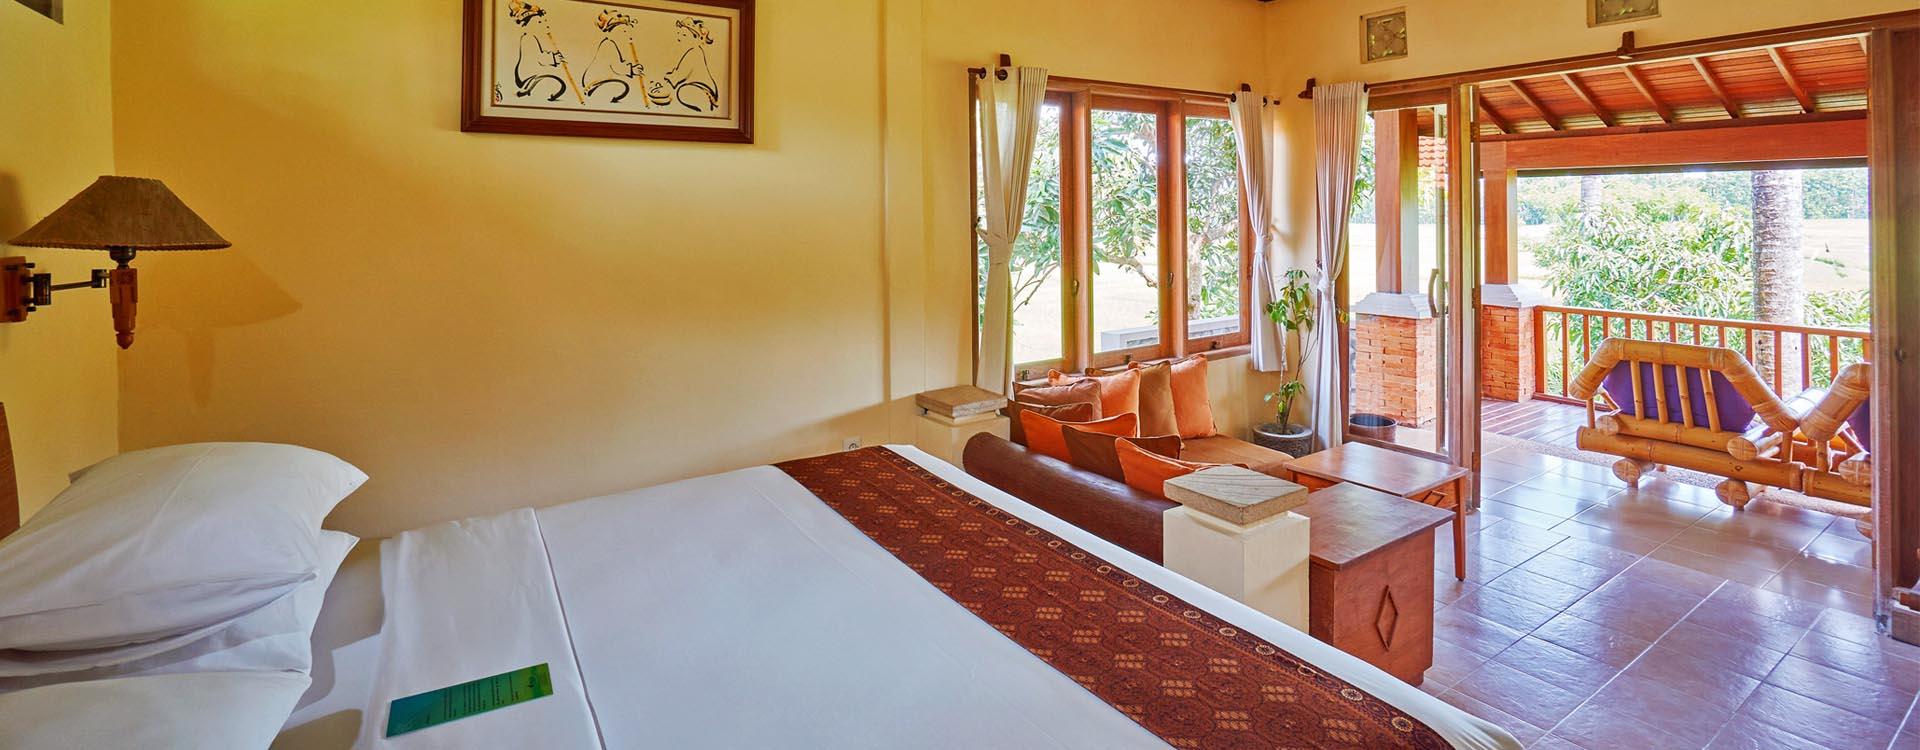 tegal sari accommodation website bali hotel